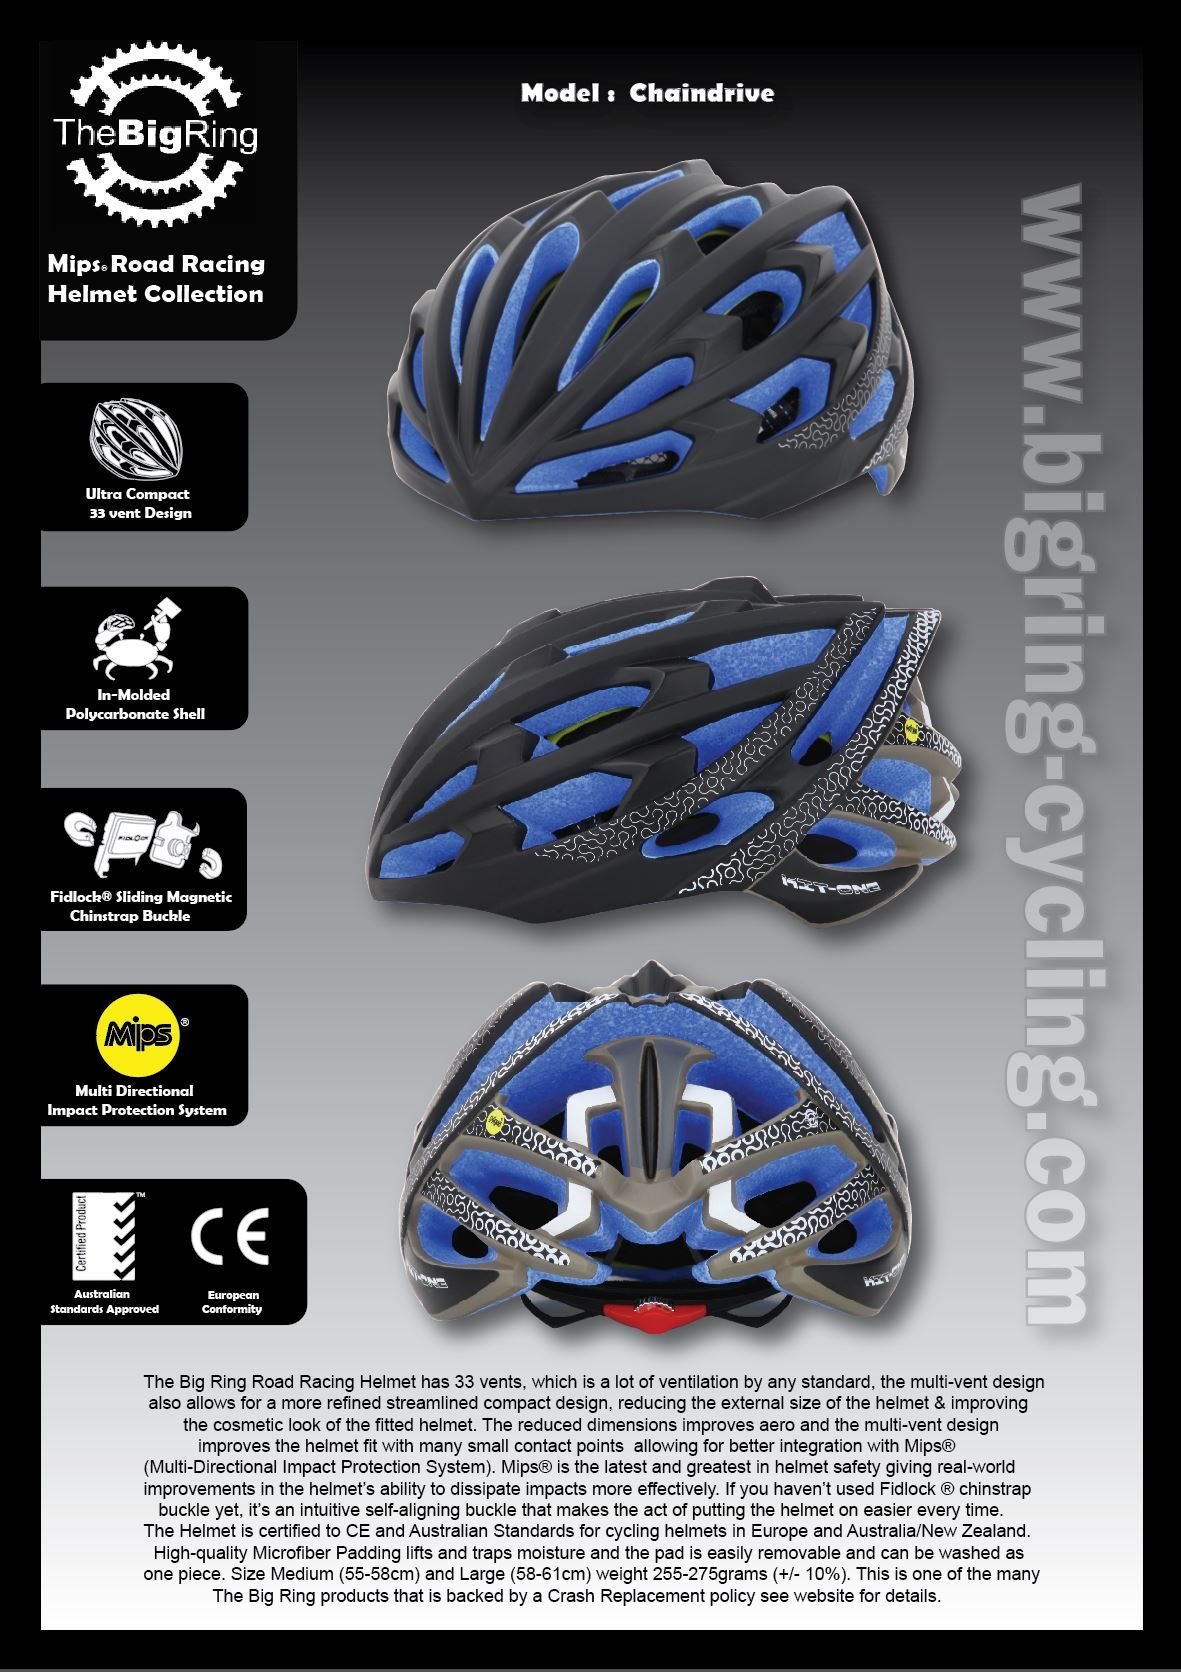 The Big Ring Mips Road Racing Helmet Has 33 Vents Lots Of